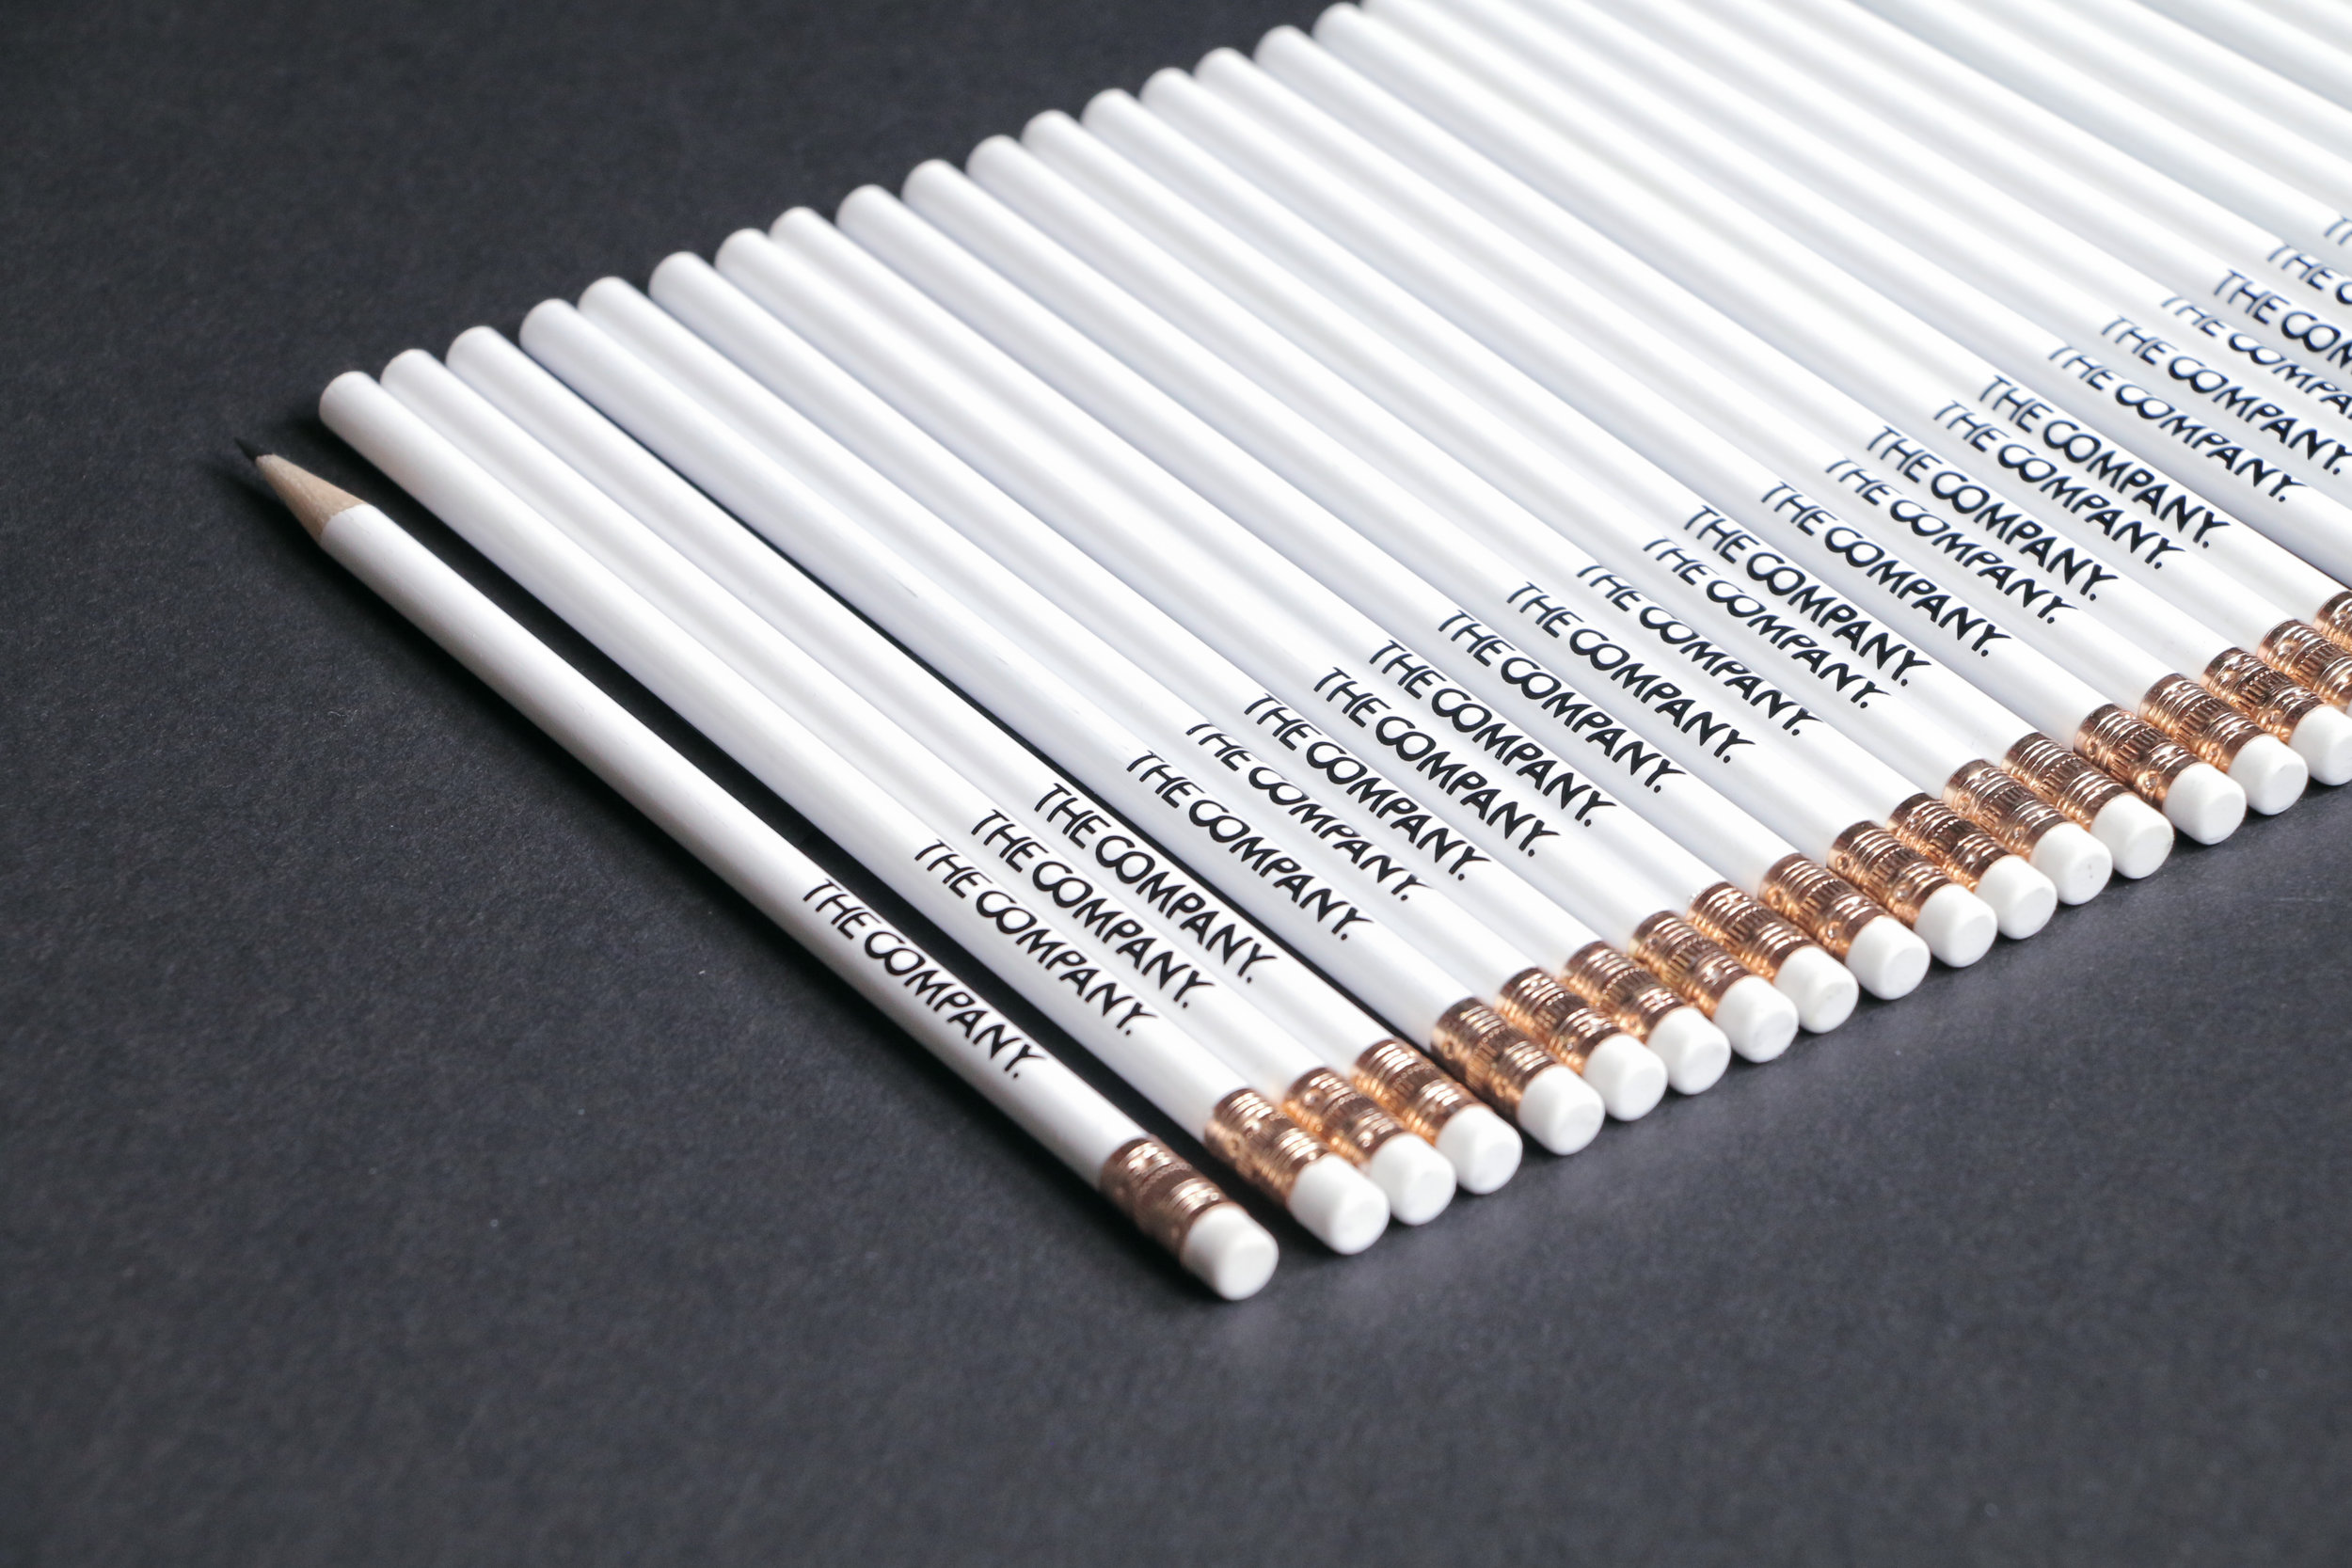 Pencils 2.jpg